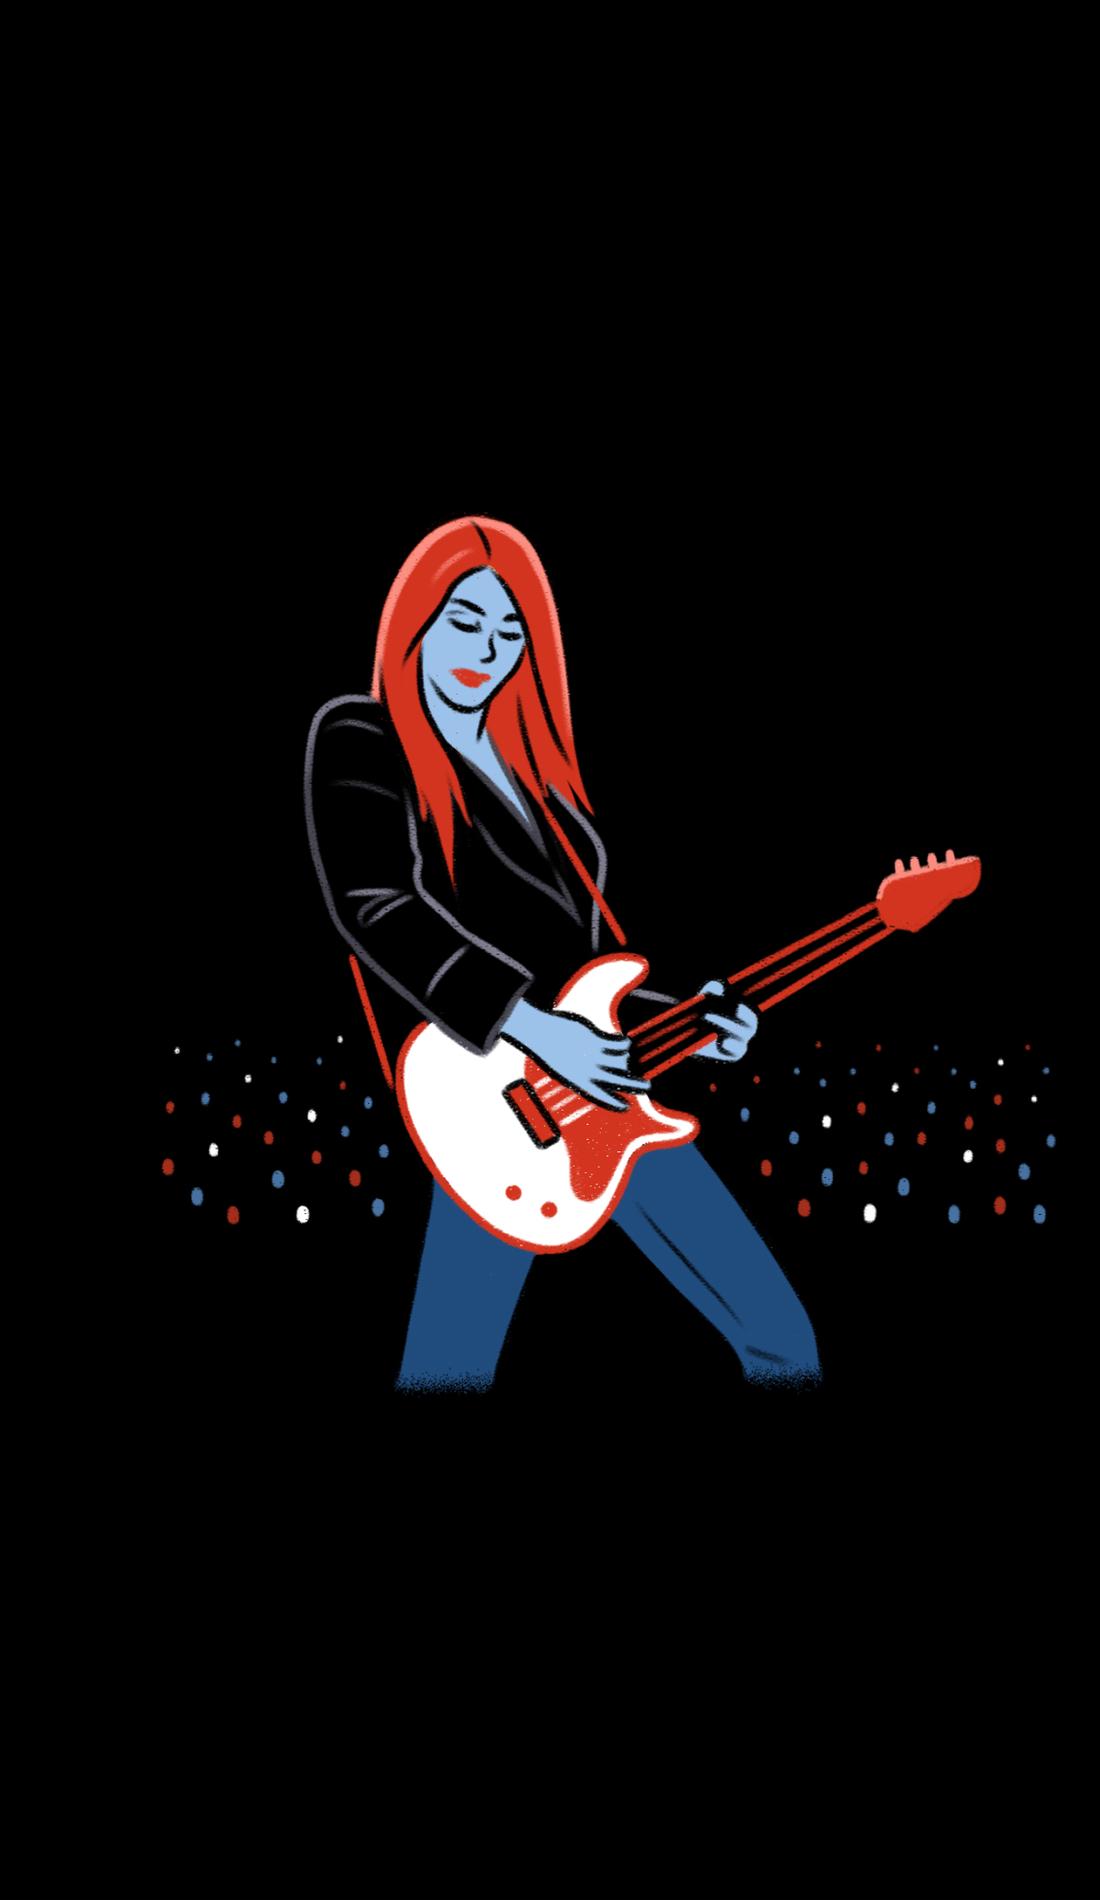 A Resurrection (Journey Tribute) live event